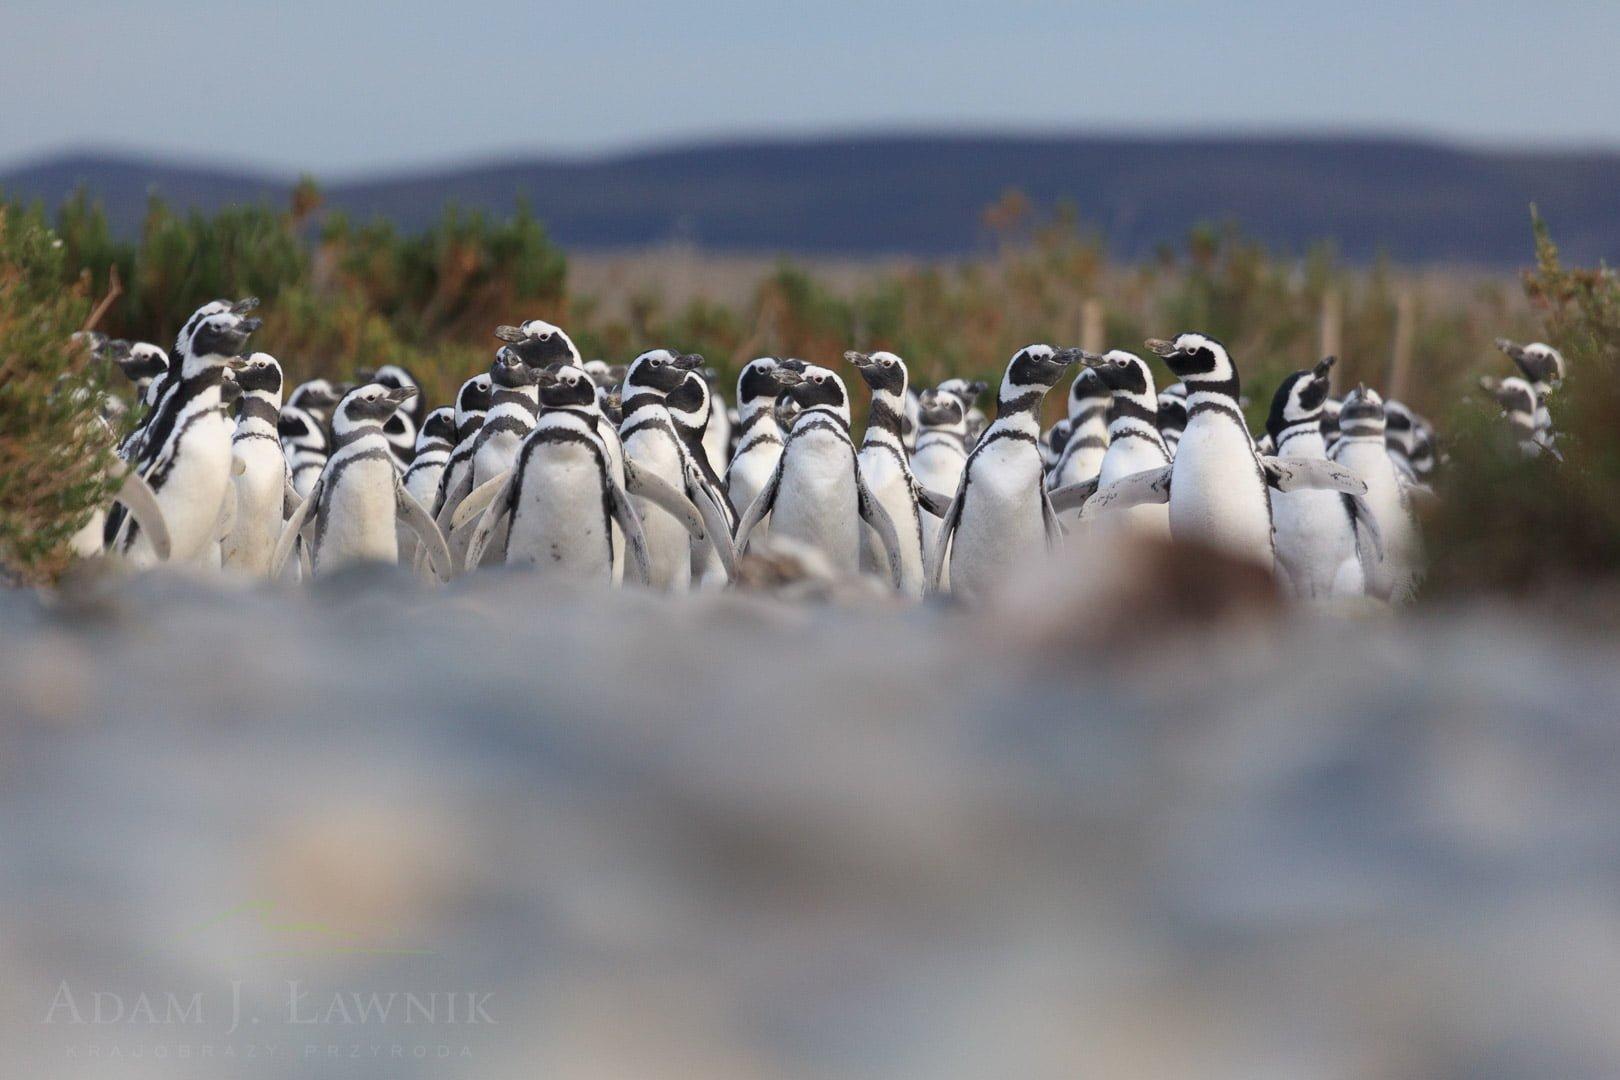 Penguins 1204-01187C